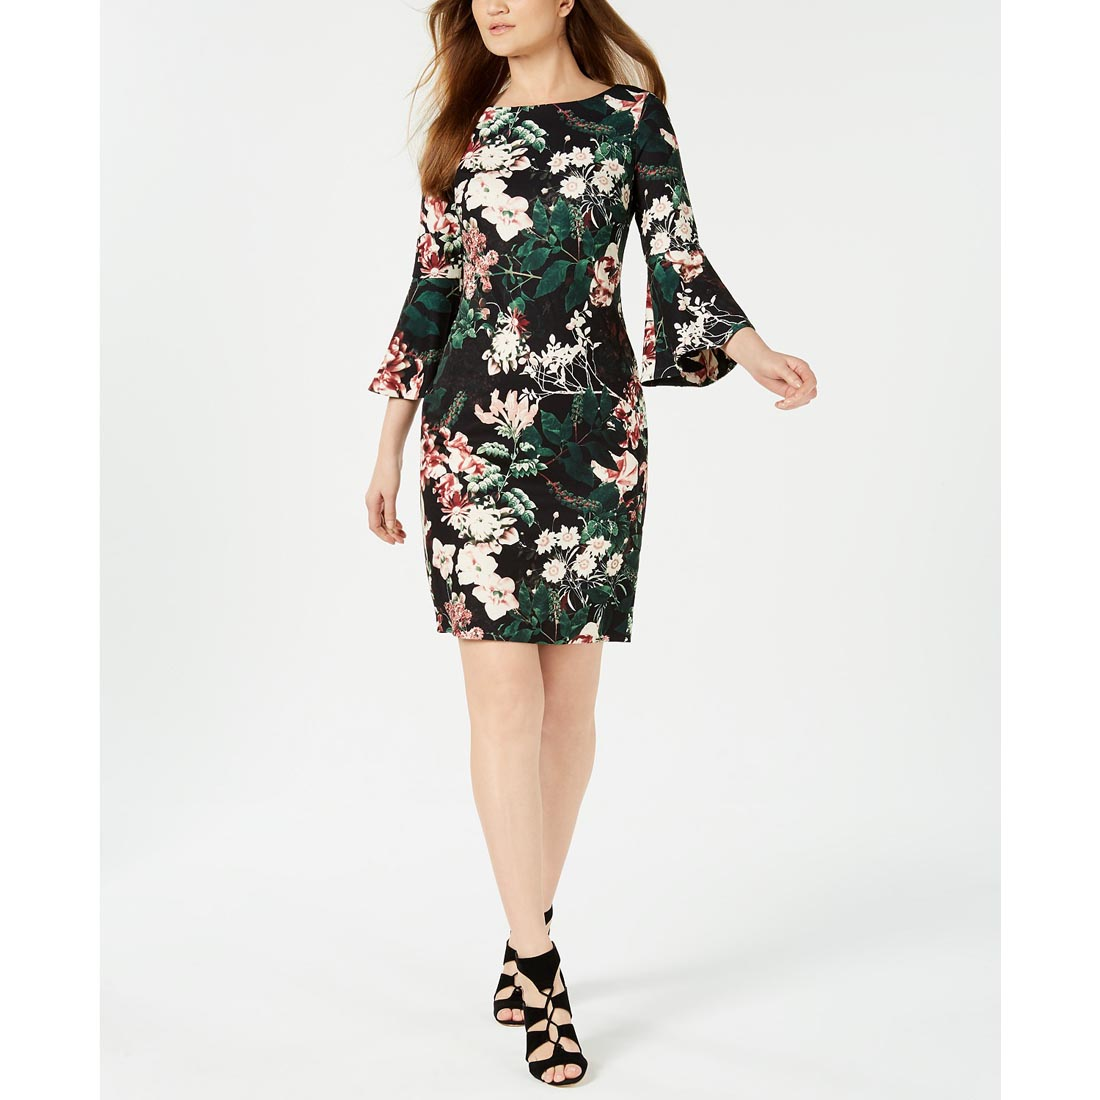 9f8cd3b199c Calvin Klein Floral Bell-Sleeve Sheath Dress